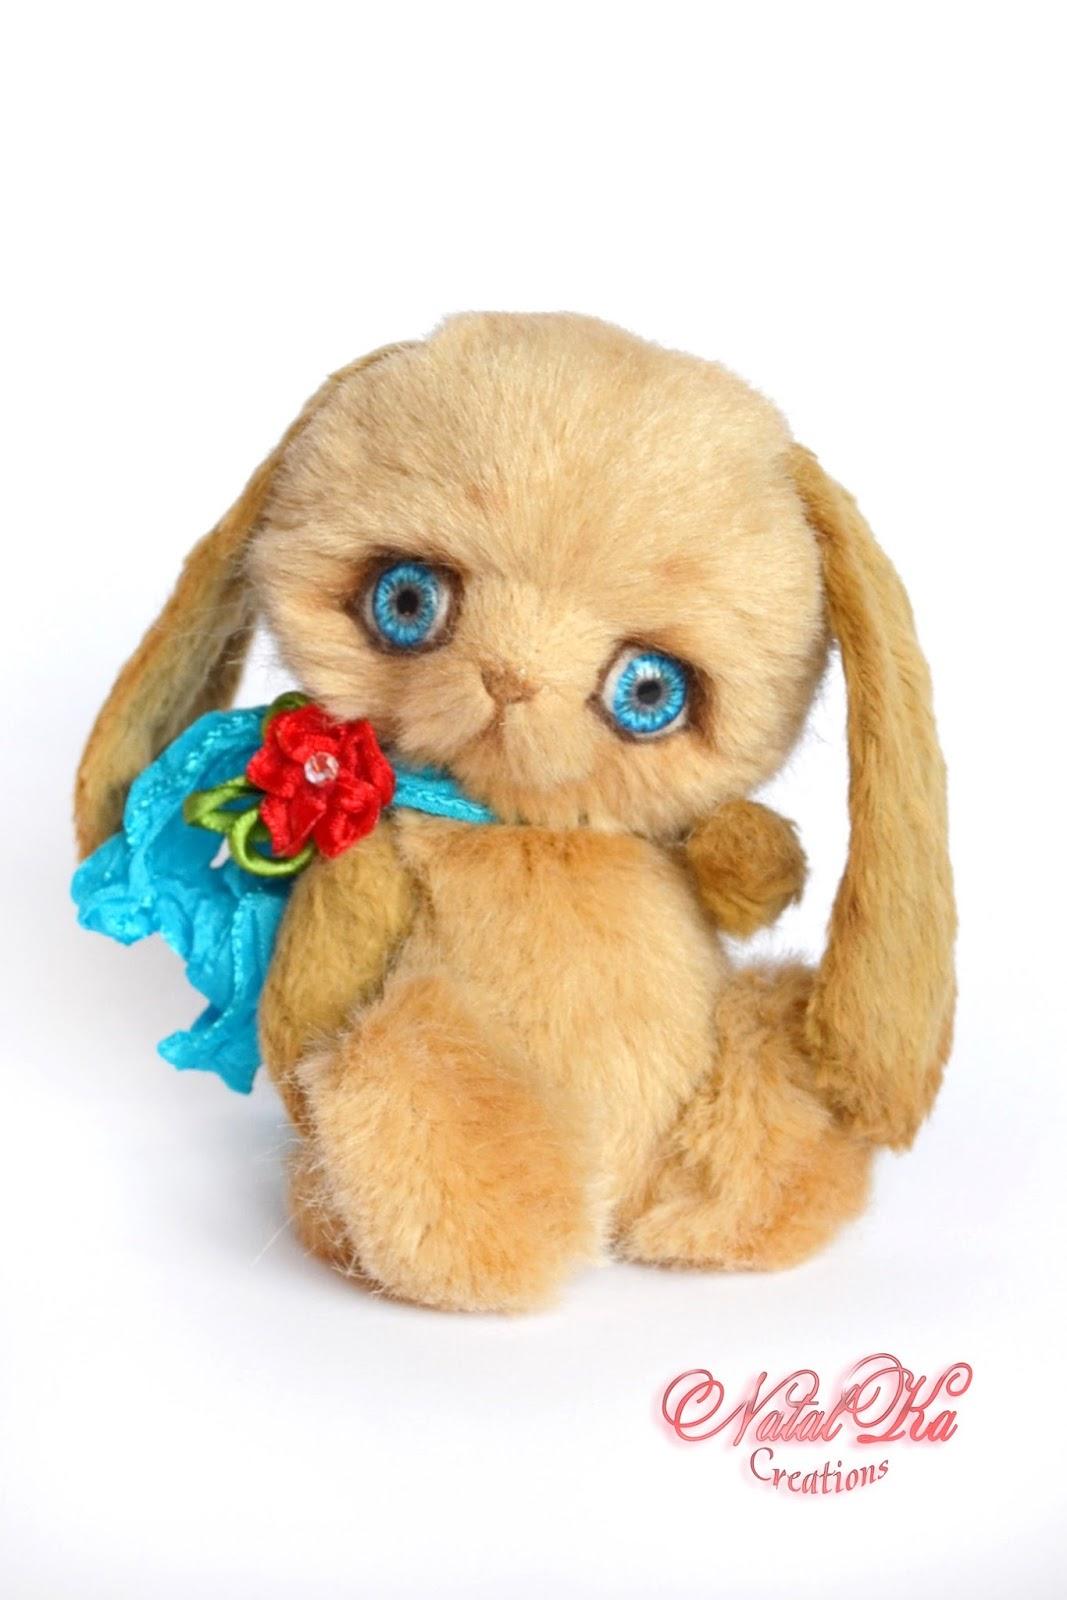 Авторский заяц тедди, тедди зайчик, кролик тедди, artist teddy bunny, teddy rabbir, artist bunny jointed, artist rabbit handmade, Künstlerhase, Künstlerteddy, Teddy Hase, Teddy Kaninchen, handmade by NatalKa Creations